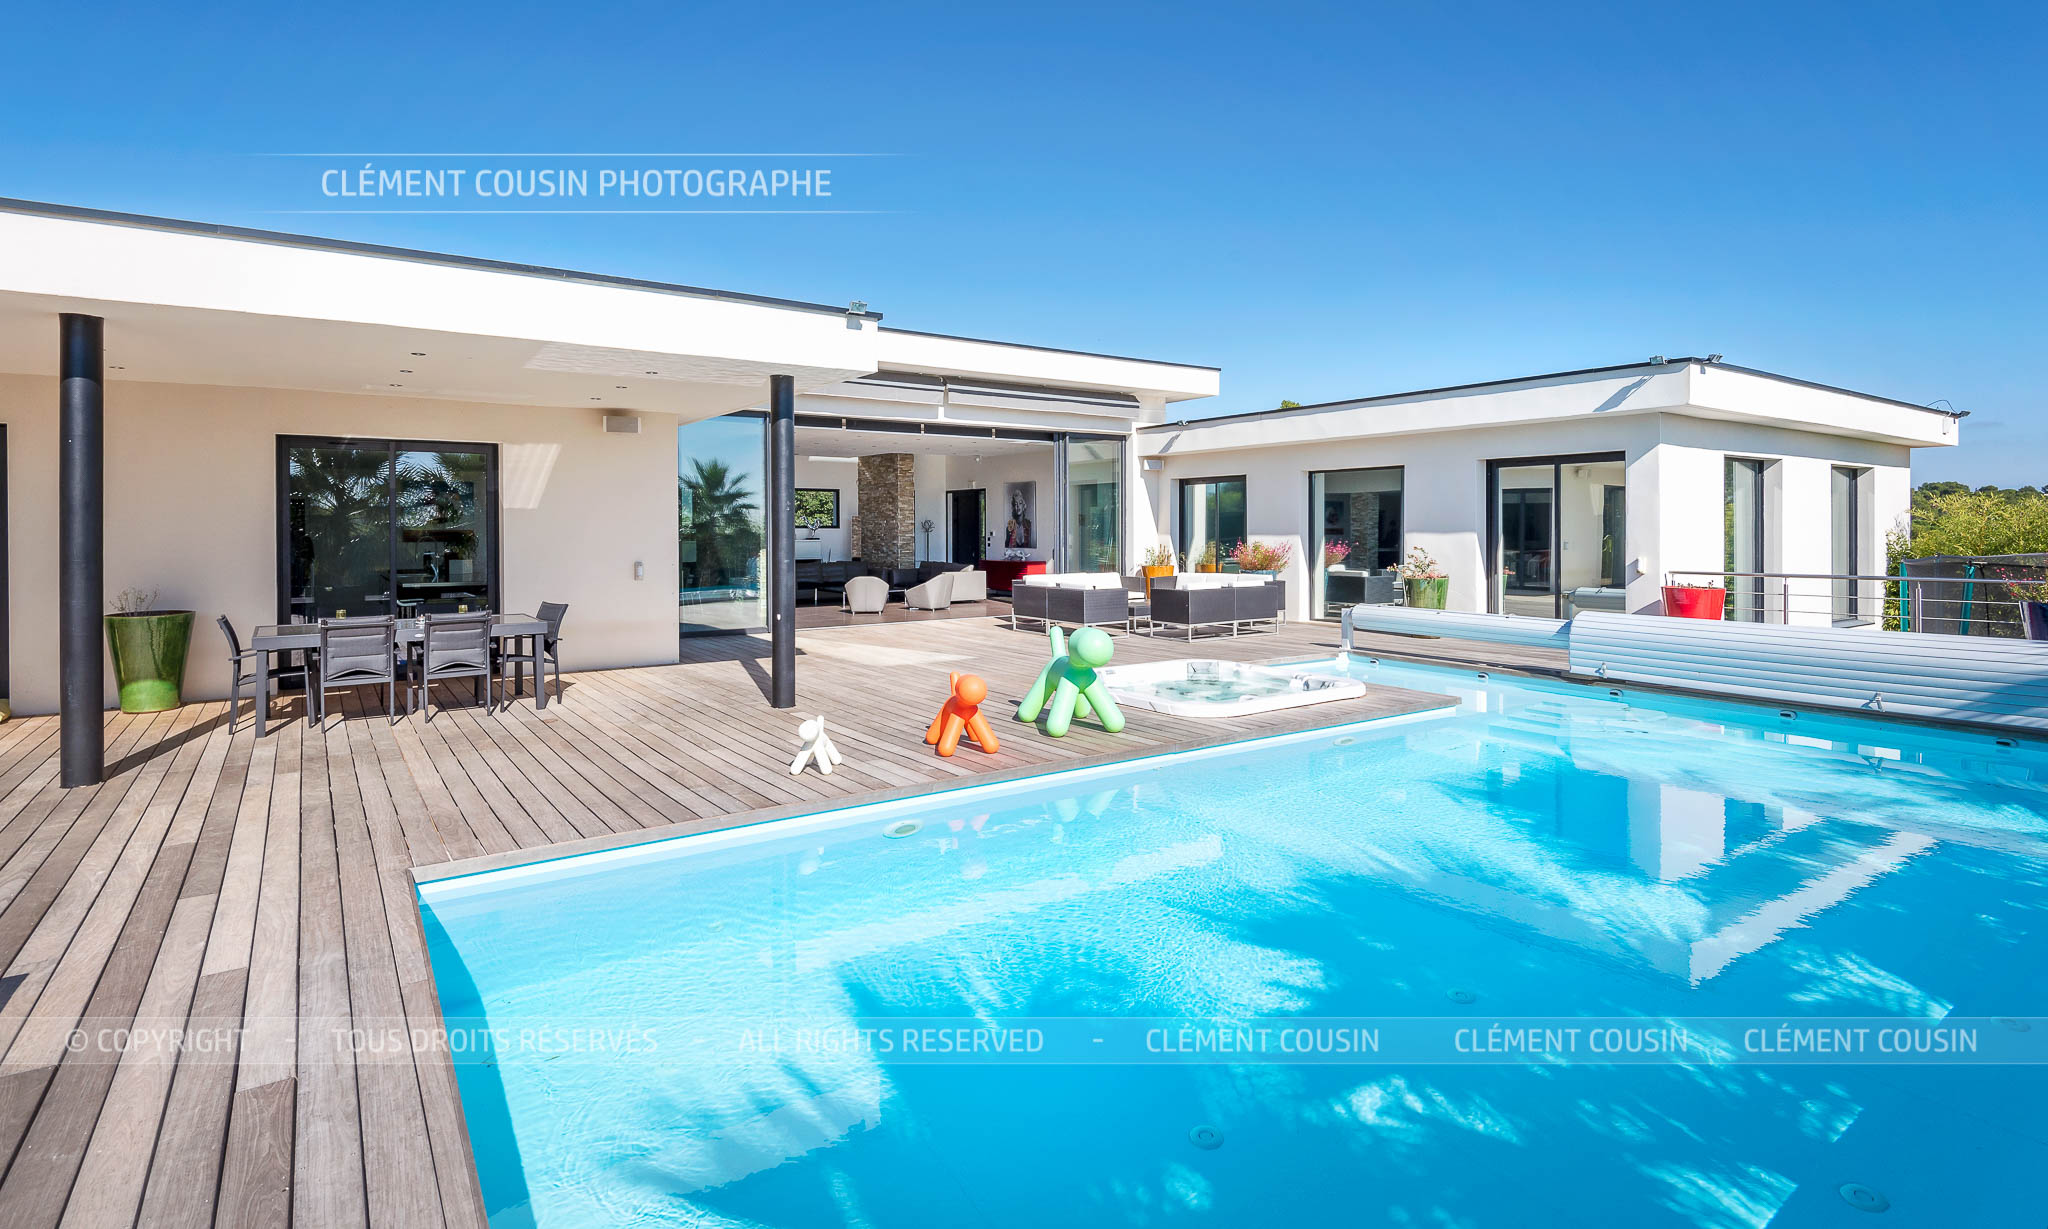 Sothebys-villa nimes-moderne-piscine-8.jpg